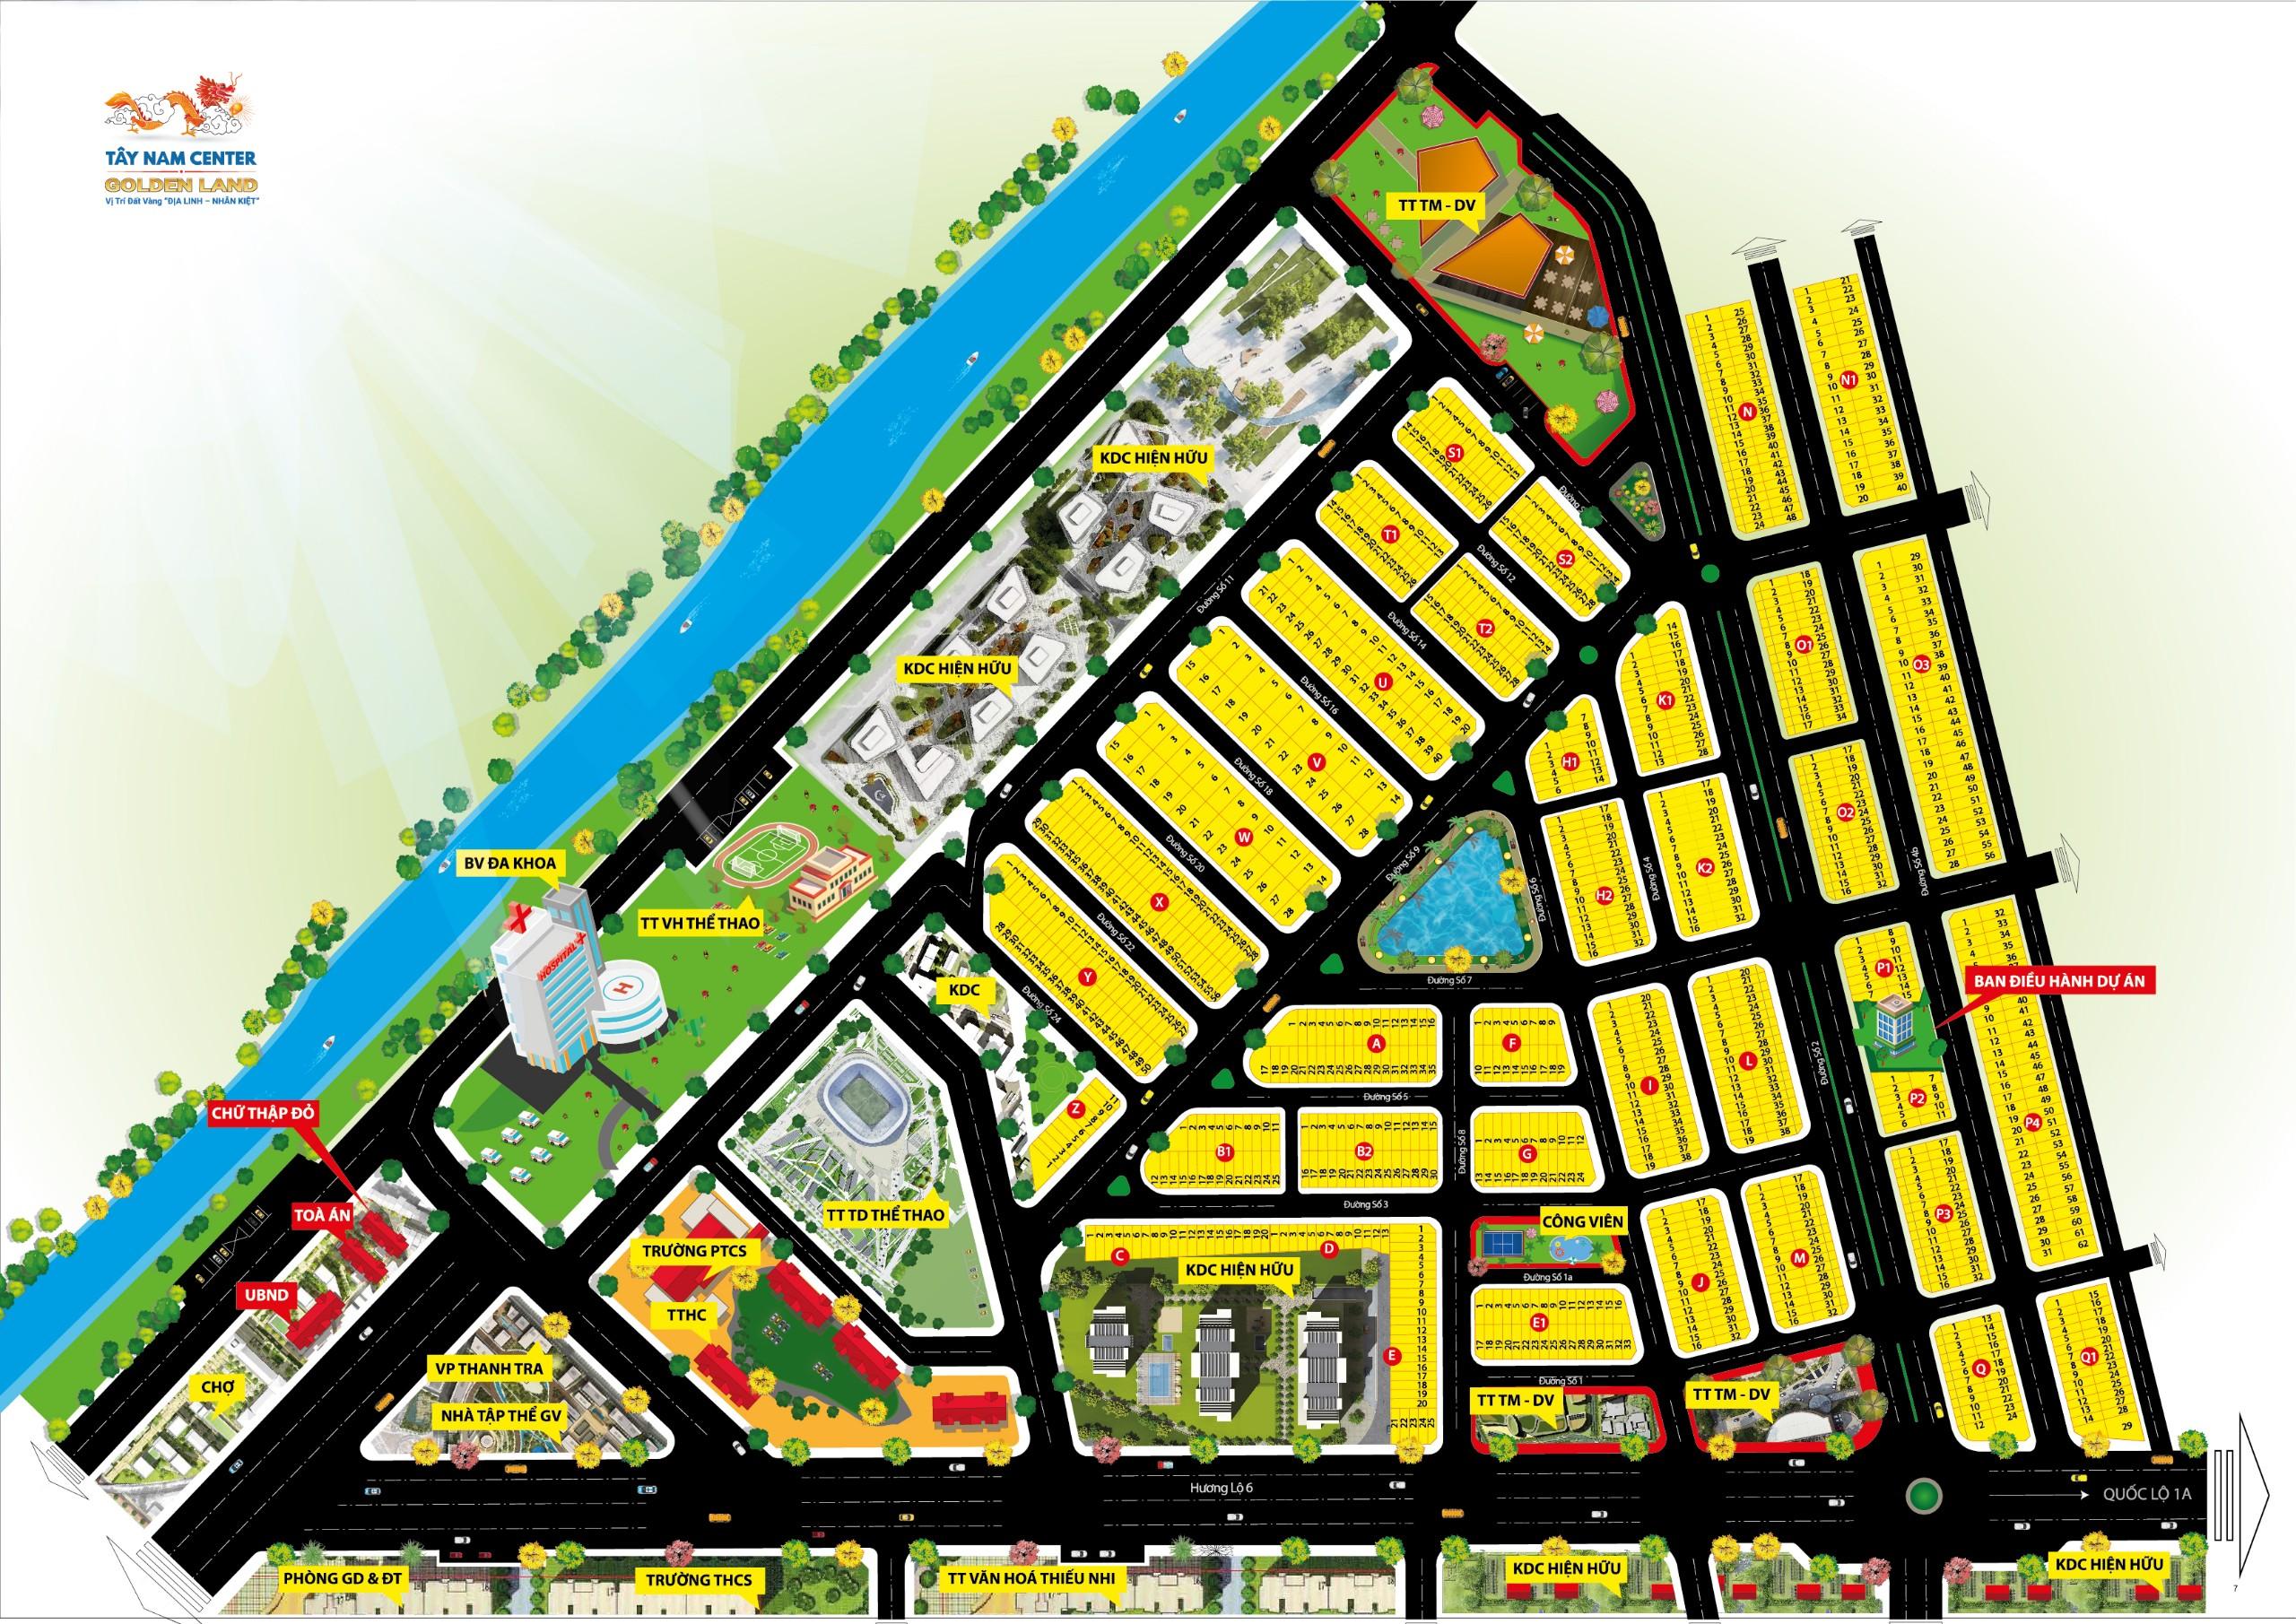 Dự án Tây Nam Center Golden Land